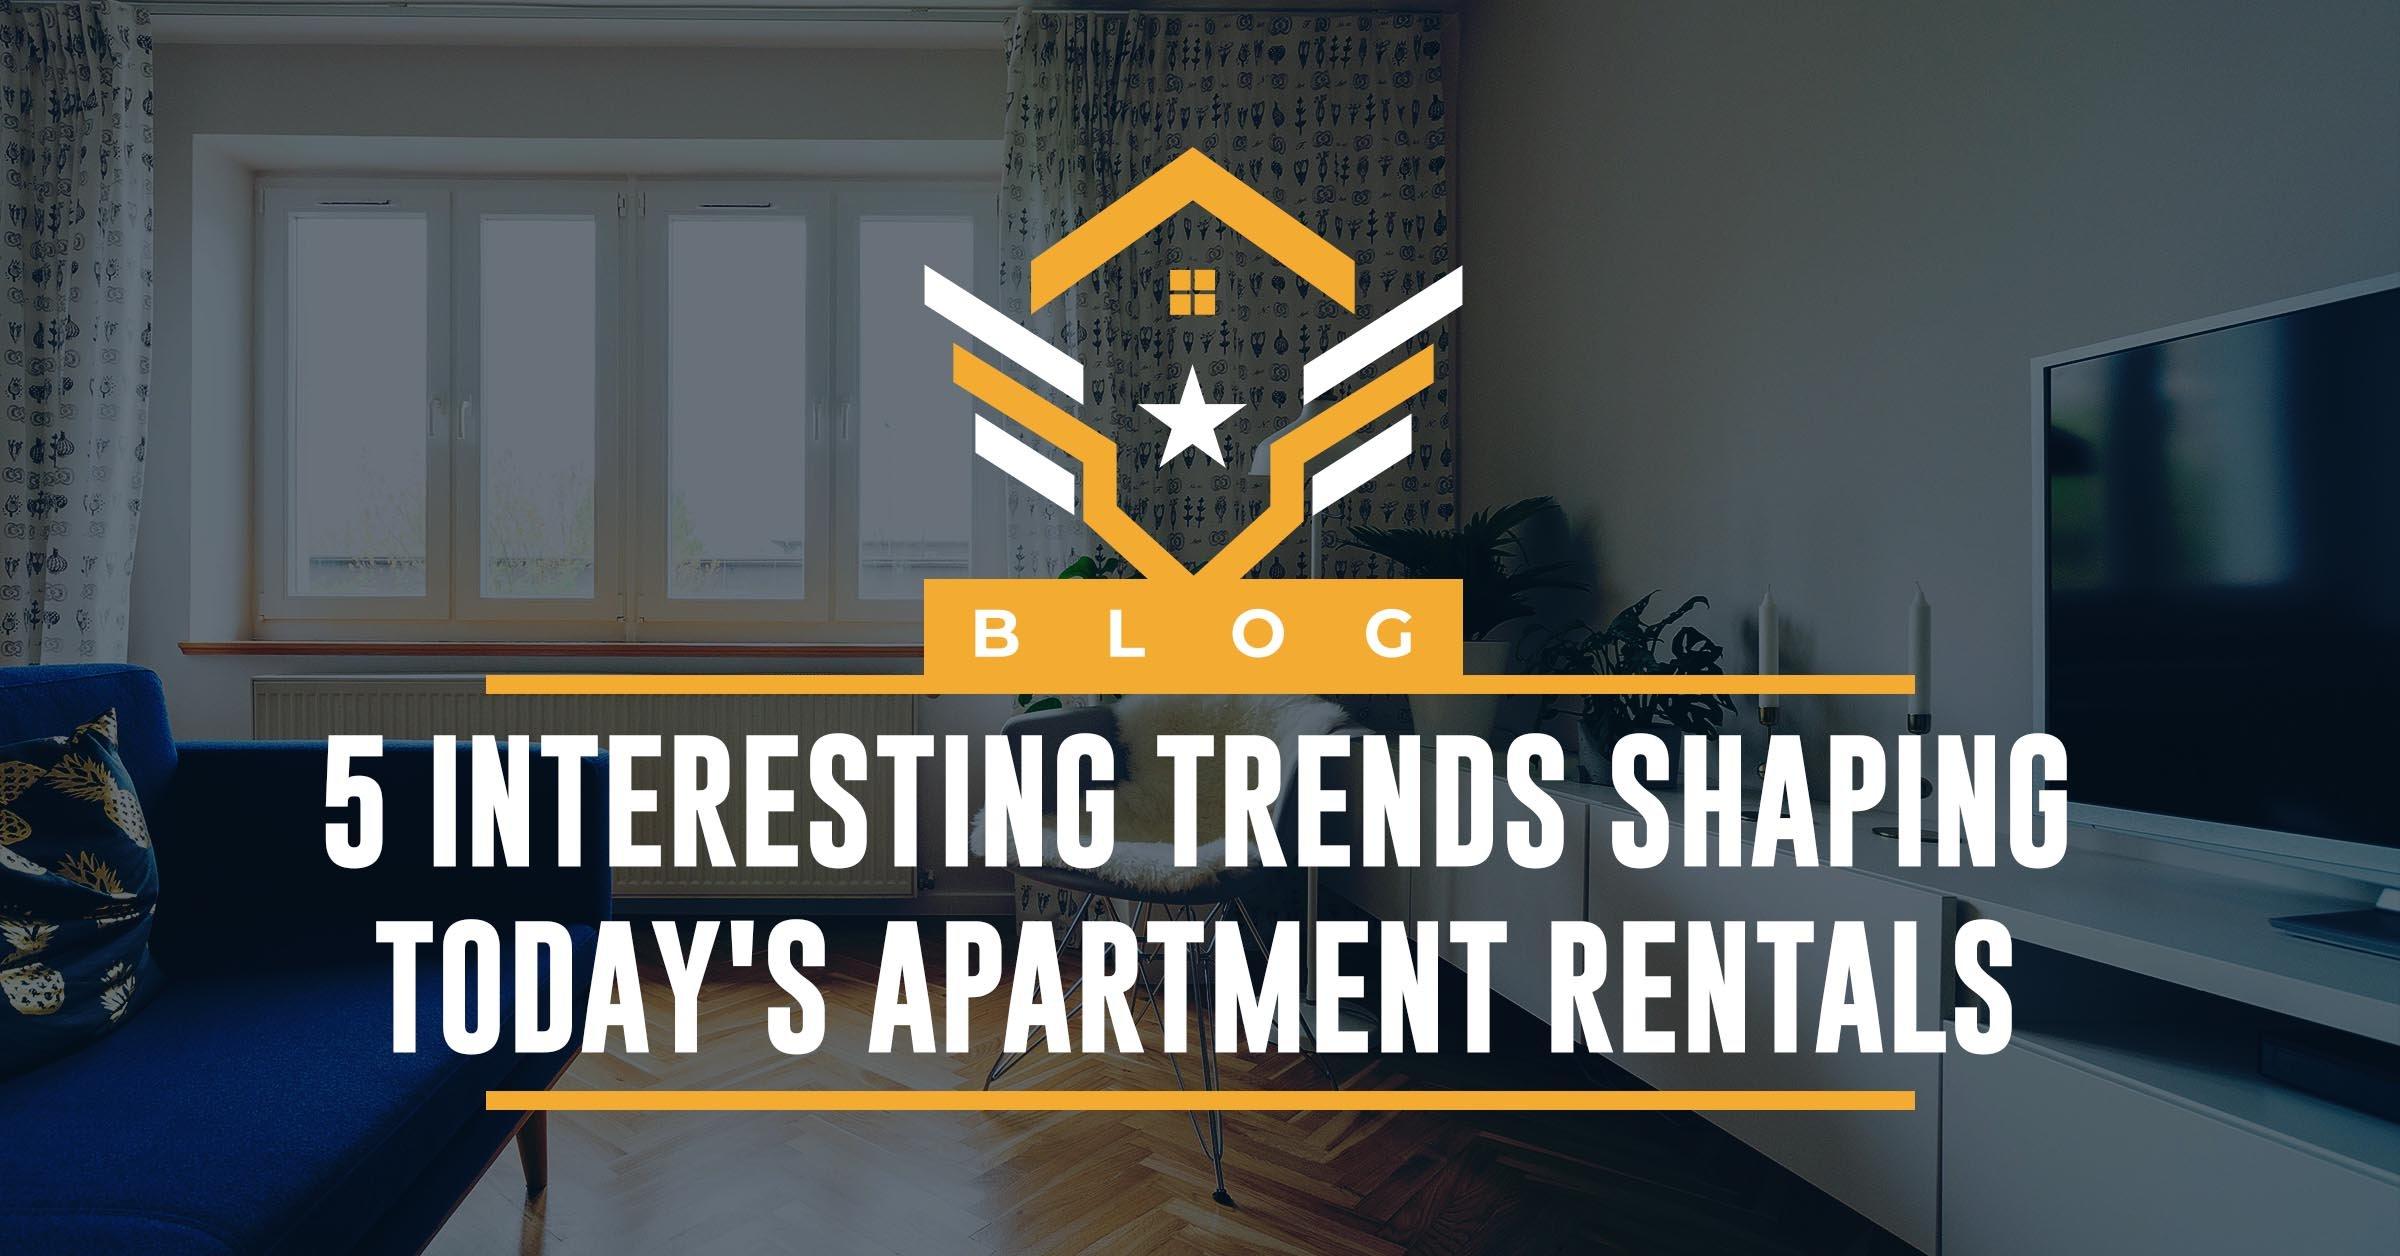 5 apartment rental trends